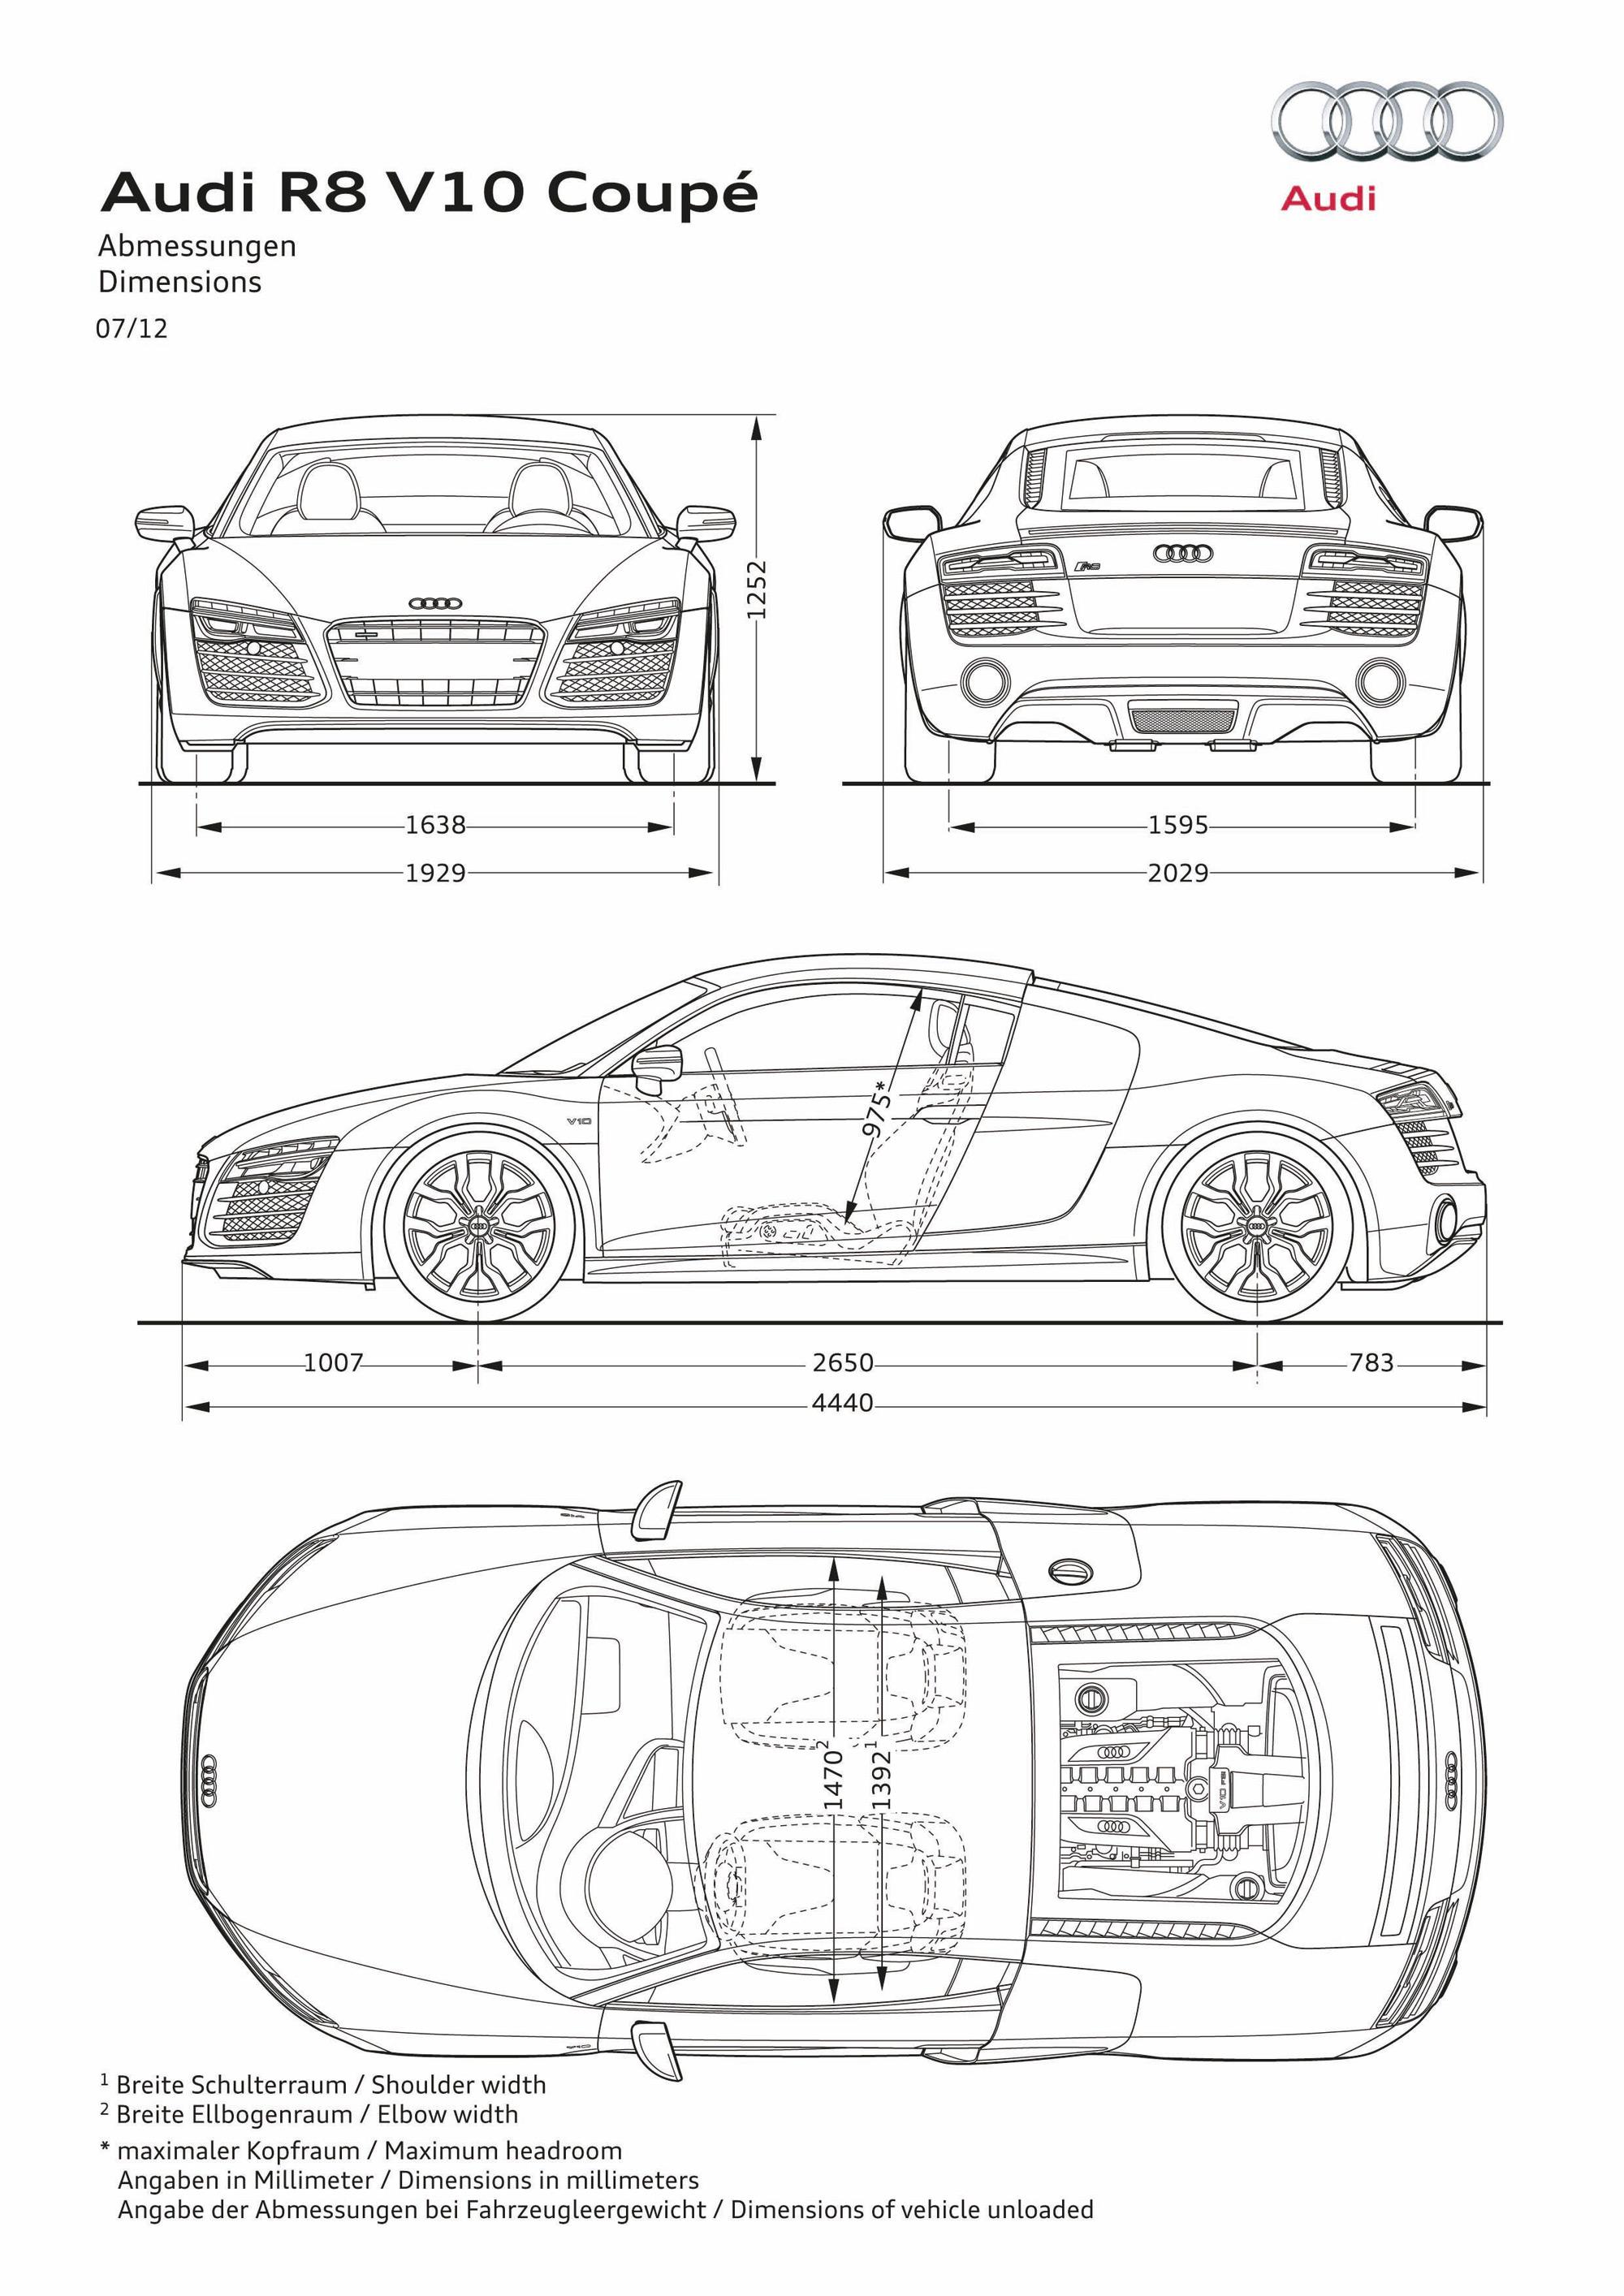 Audi R8 Wiring Diagram - wiring diagram boards-ready -  boards-ready.mdcromaovest.it | Audi R8 Spyder Engine Diagram |  | mdcromaovest.it